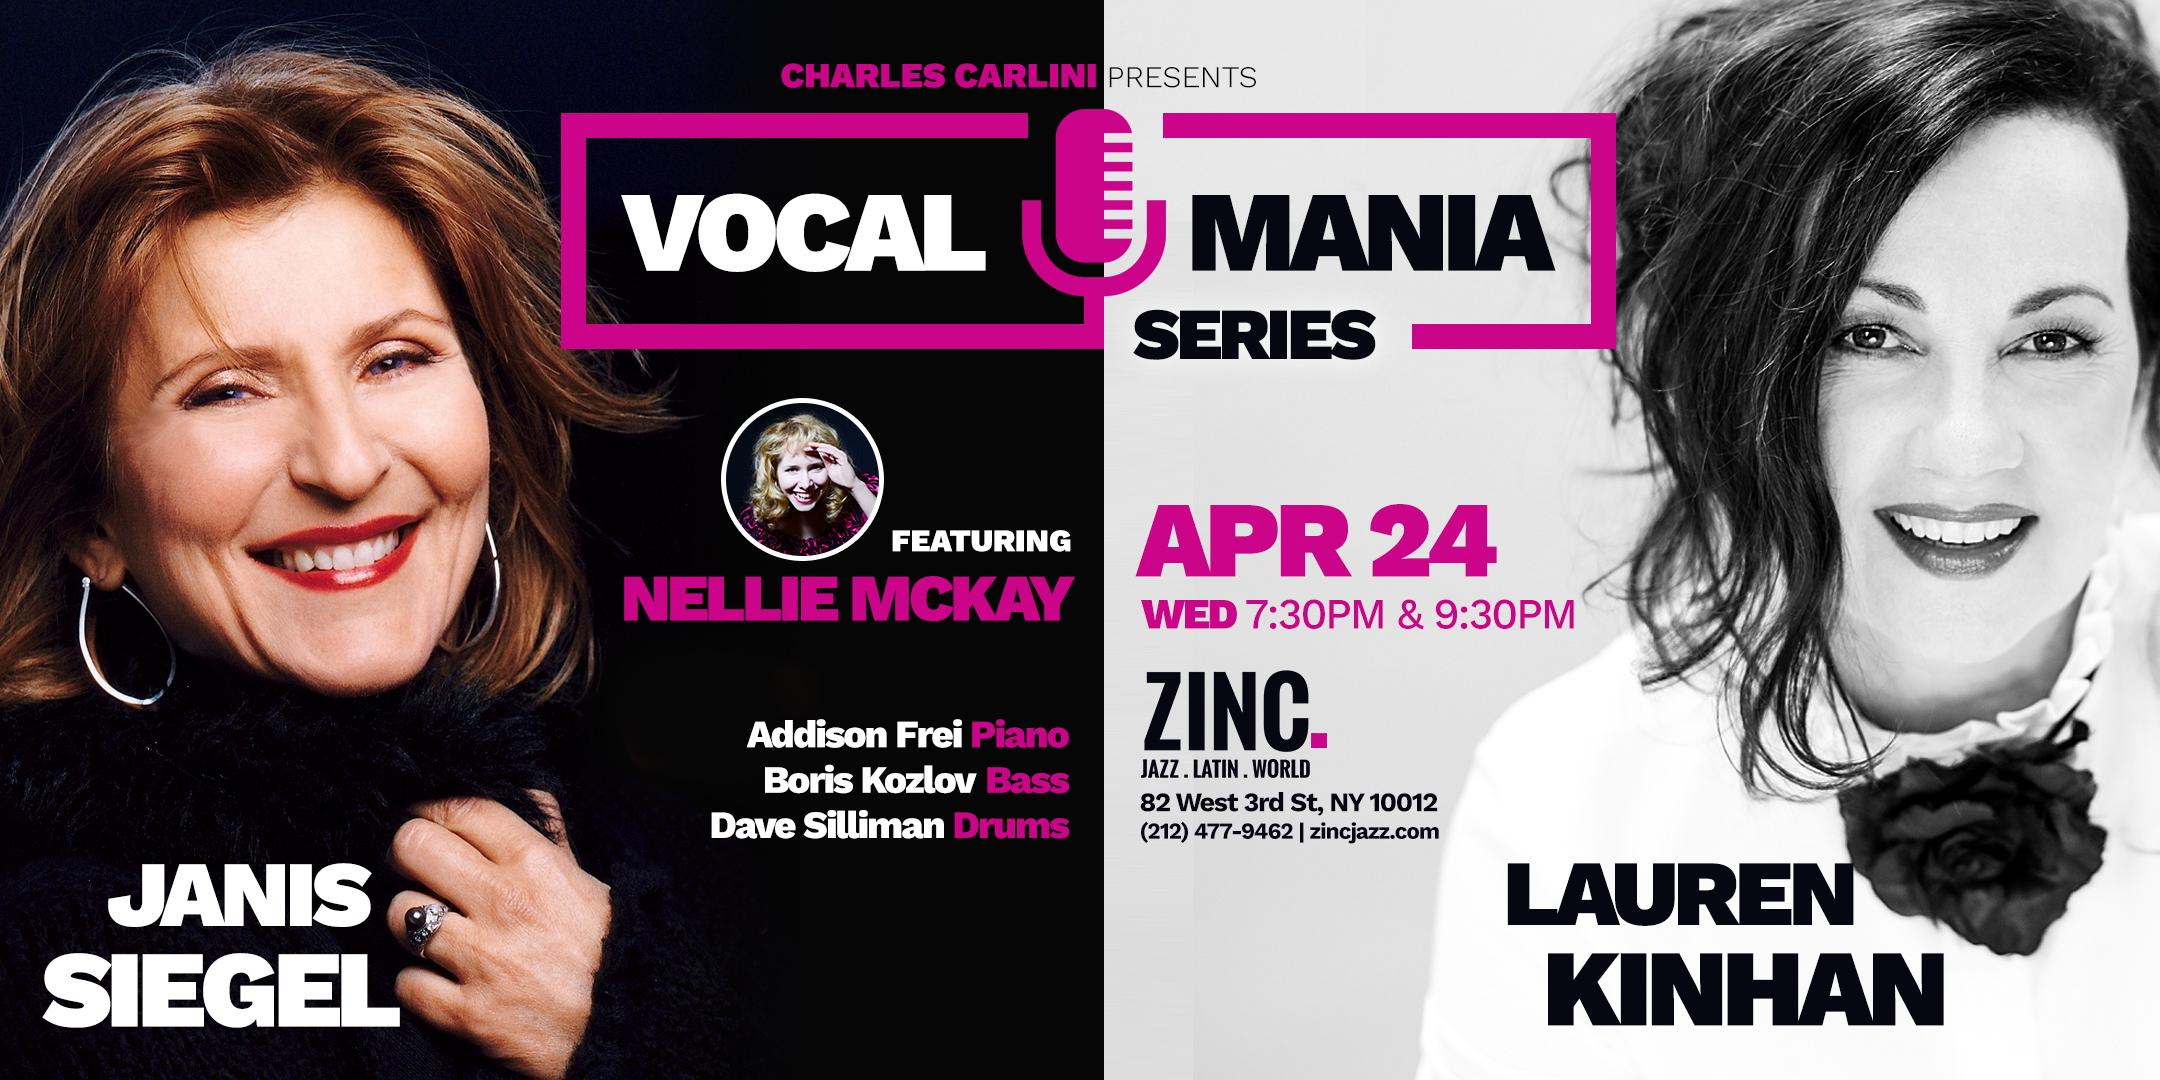 Vocal Mania Series: Janis Siegel & Lauren Kinhan ft. Nellie McKay